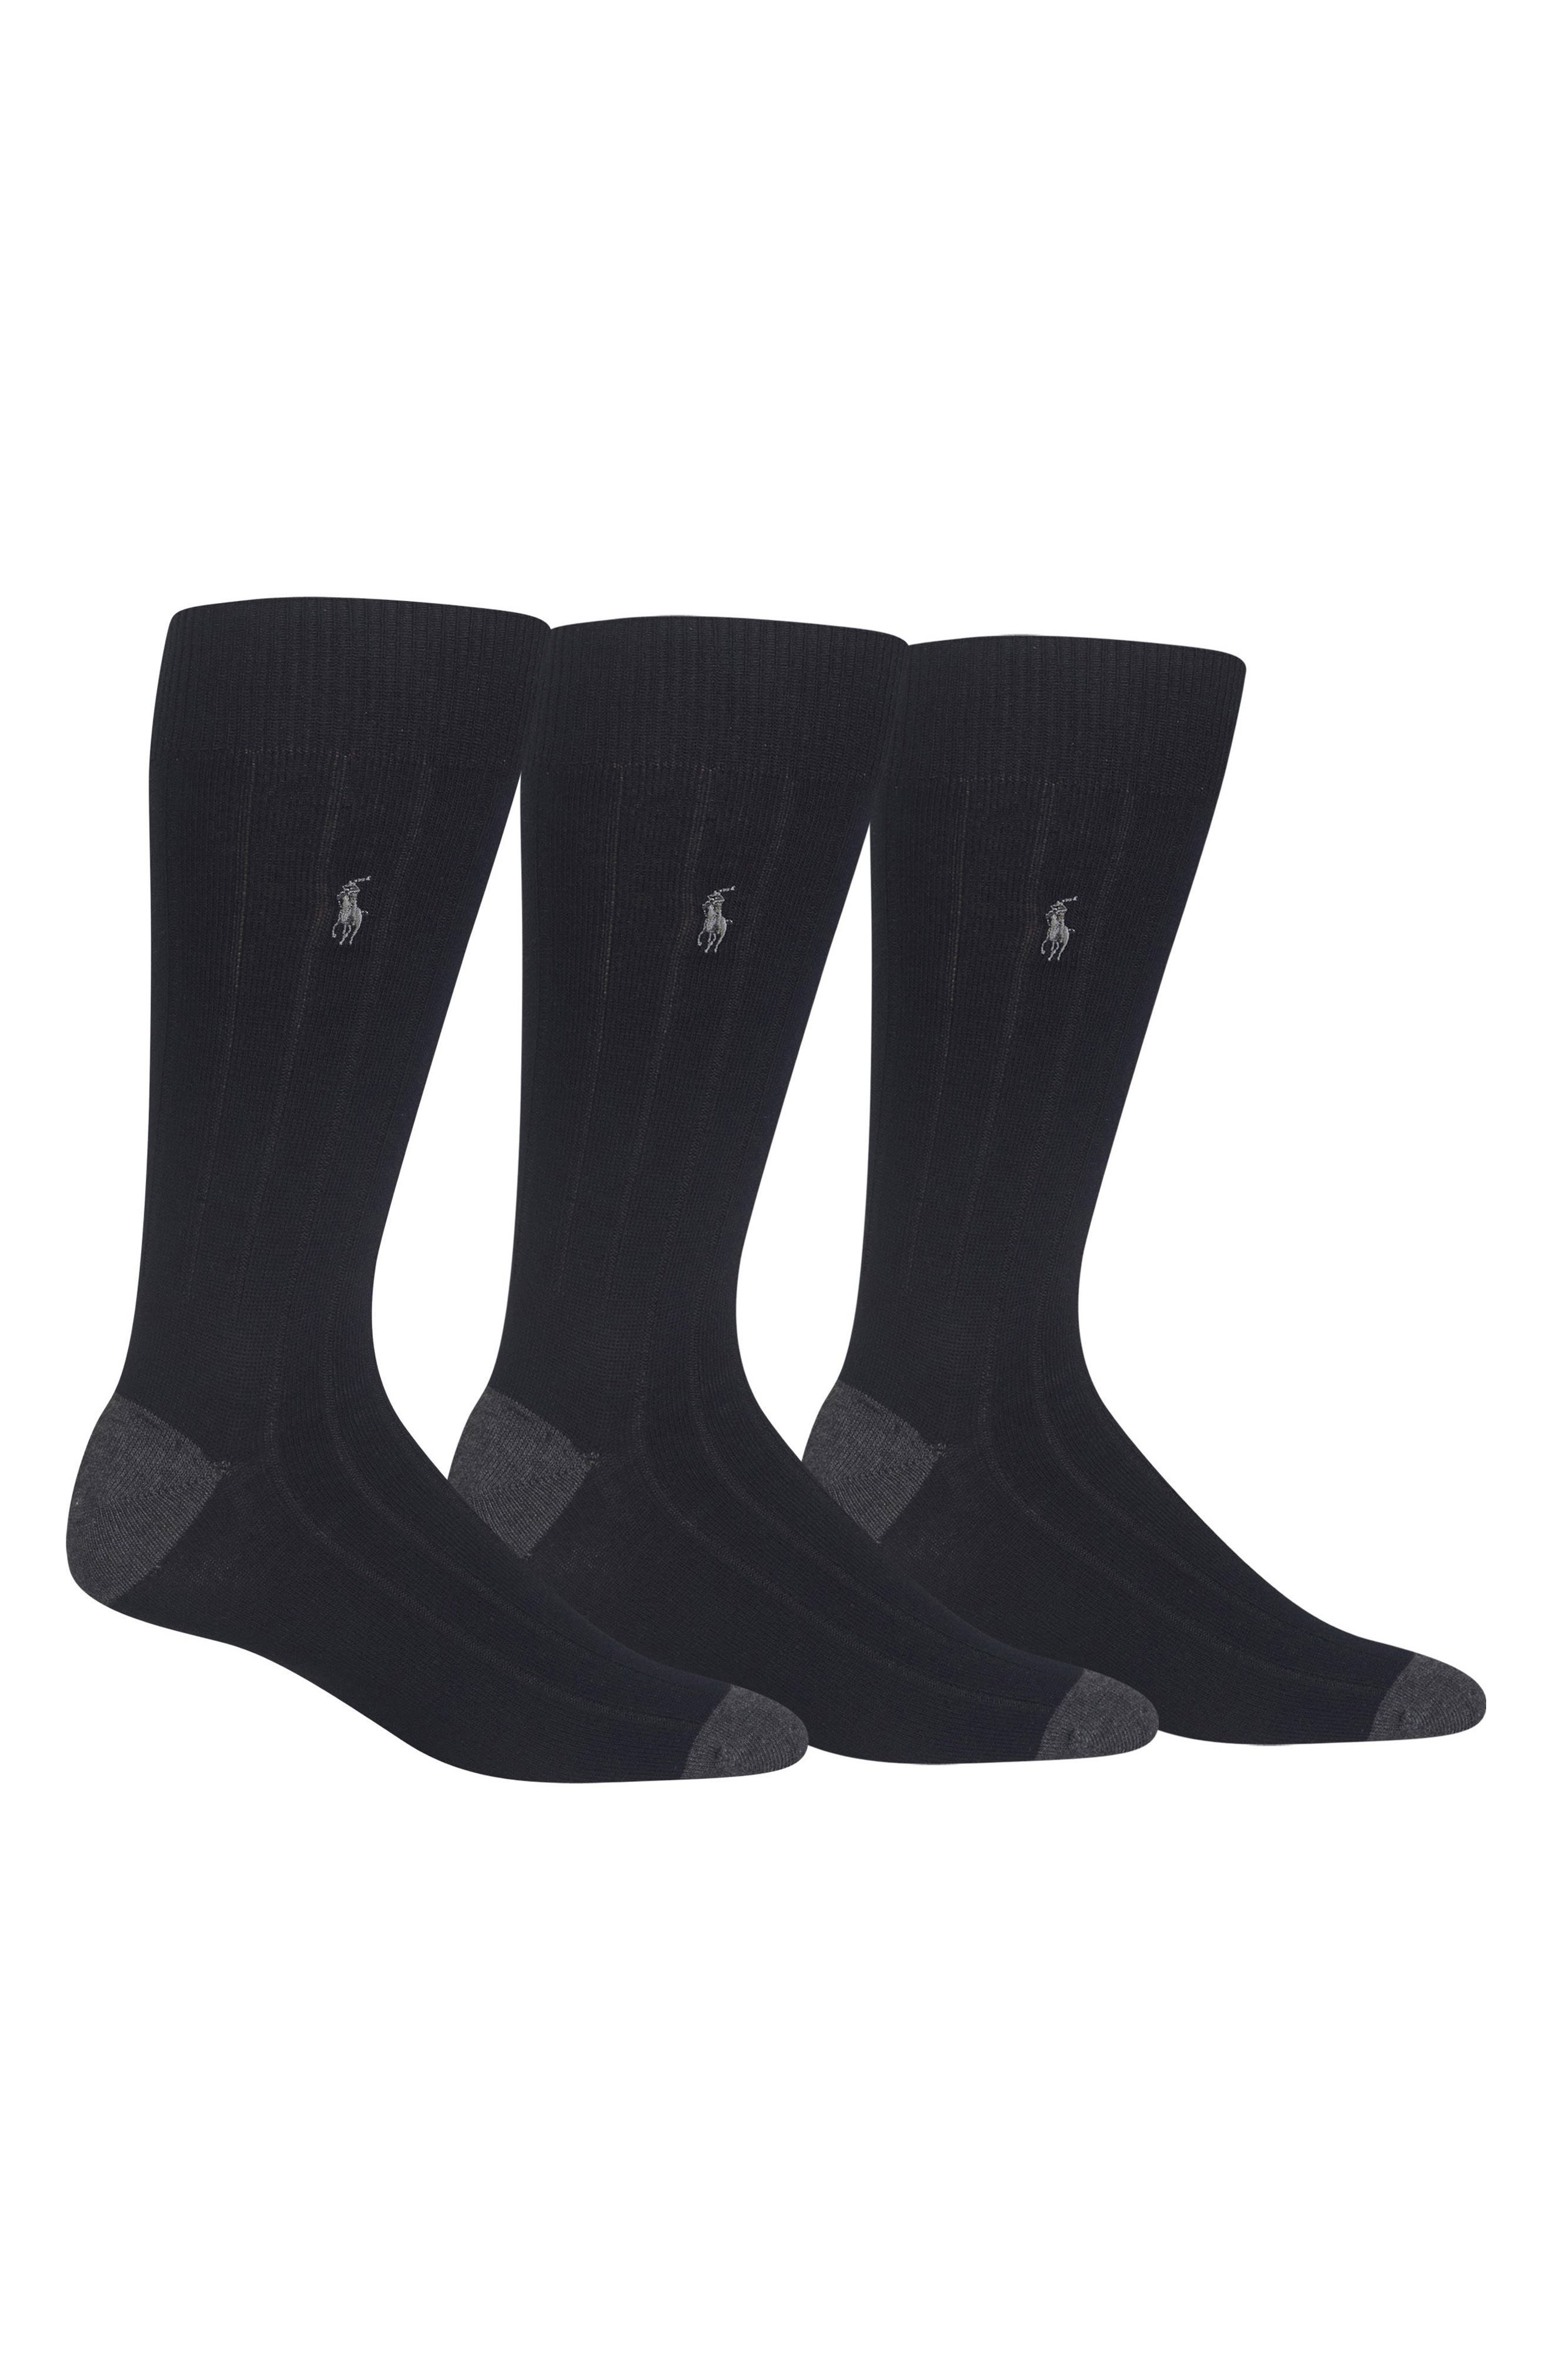 POLO RALPH LAUREN 3-Pack Ribbed Socks, Main, color, BLACK